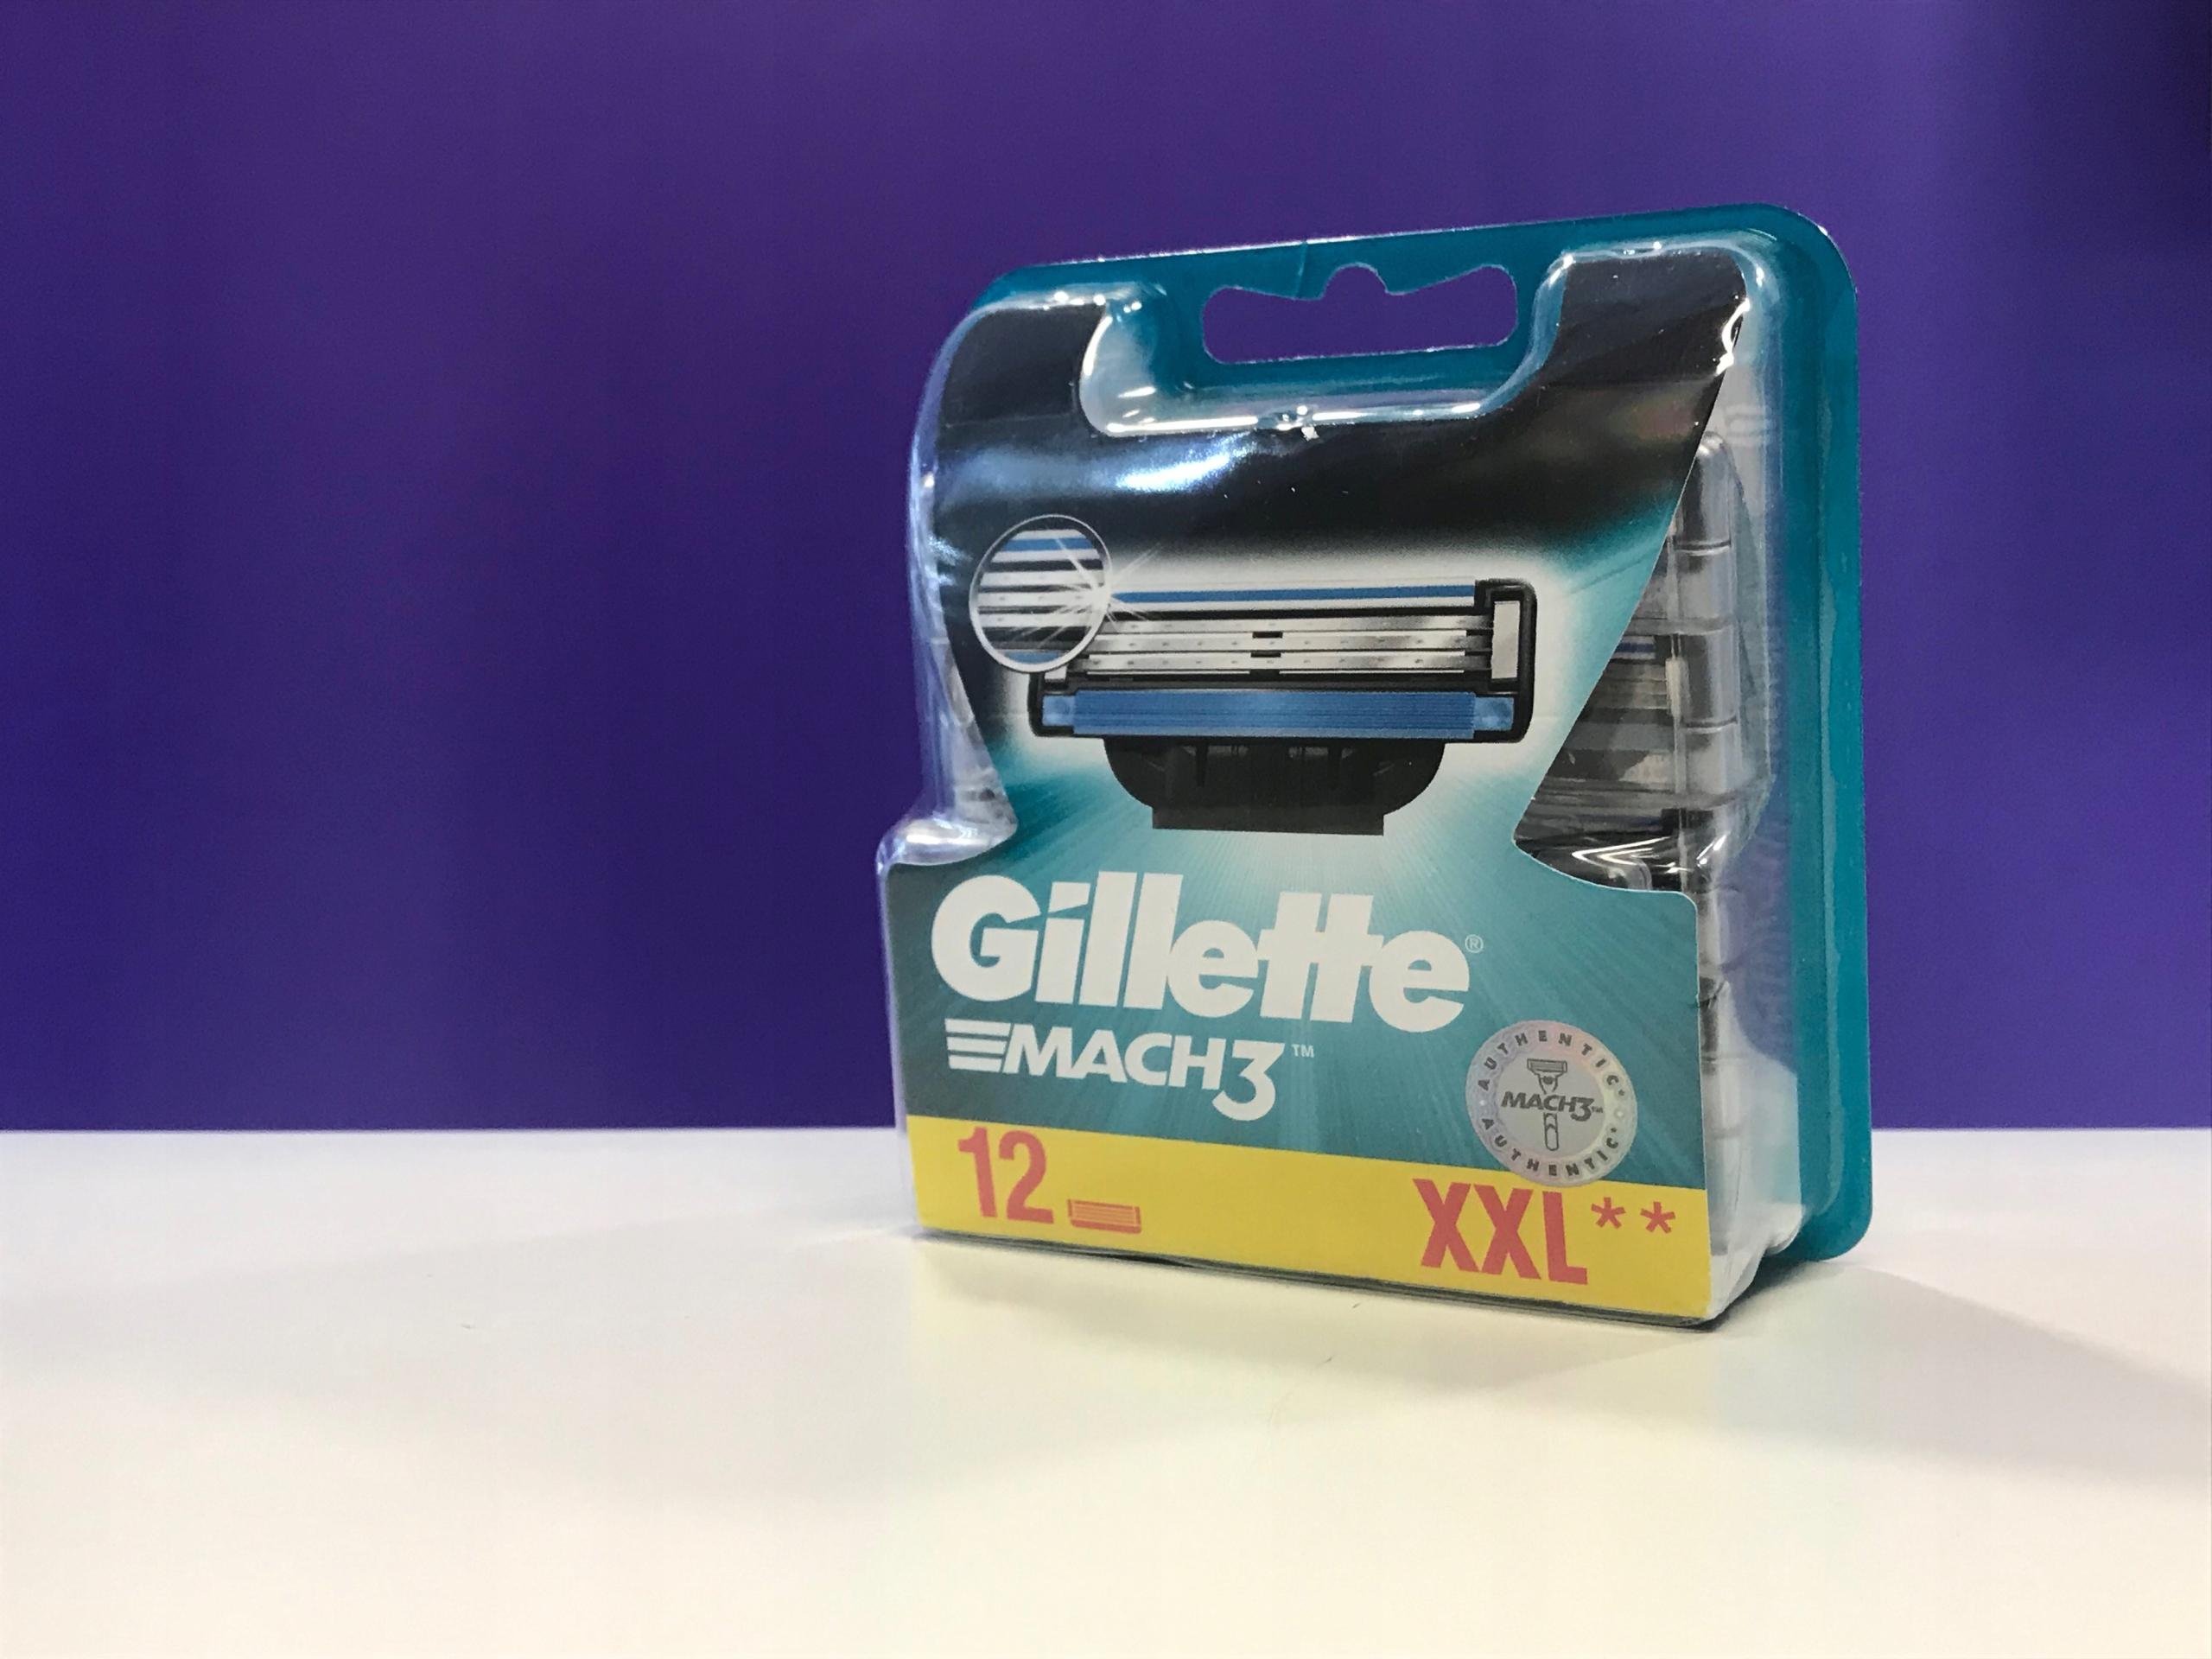 Ostrza Gillette Mach 3 XXL 12szt. 2354/01